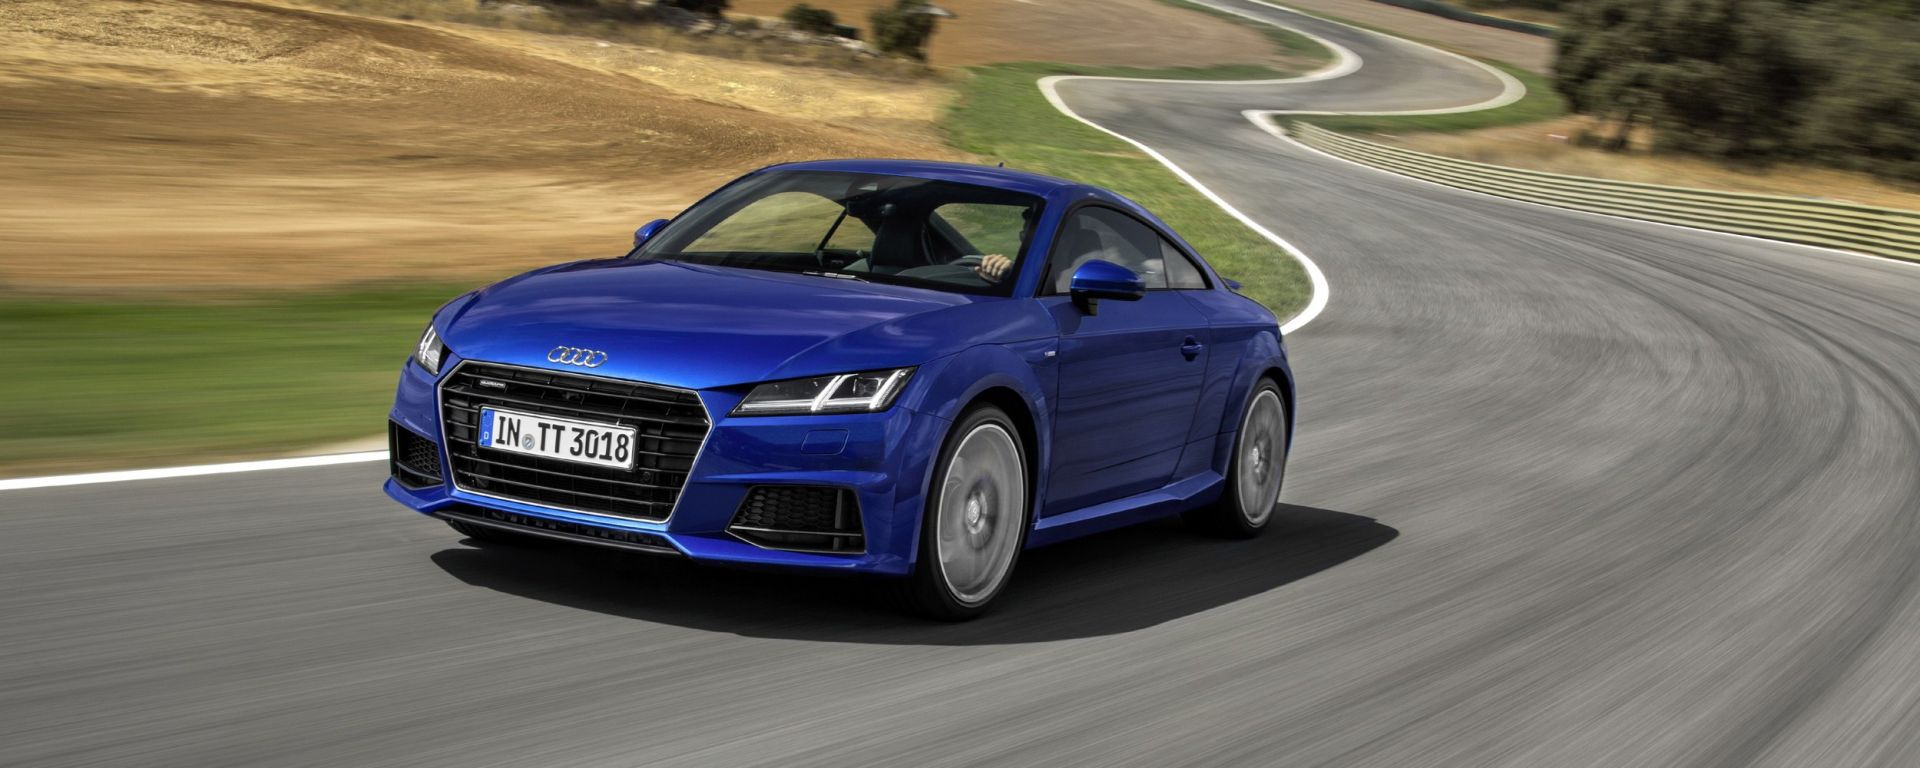 Nuova Audi TT Coupé 2015